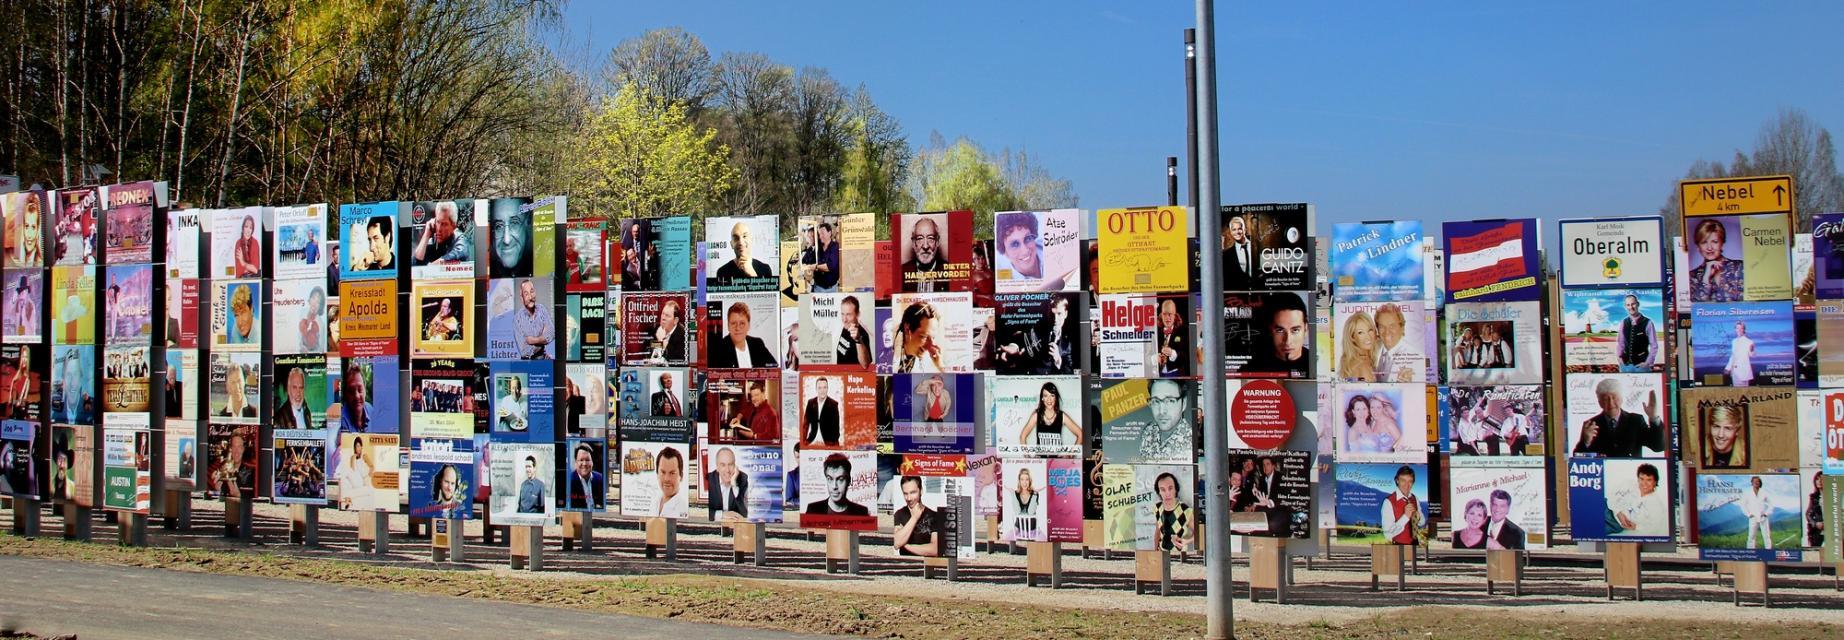 Fernweh-Park Oberkotzau - Signs of Fame